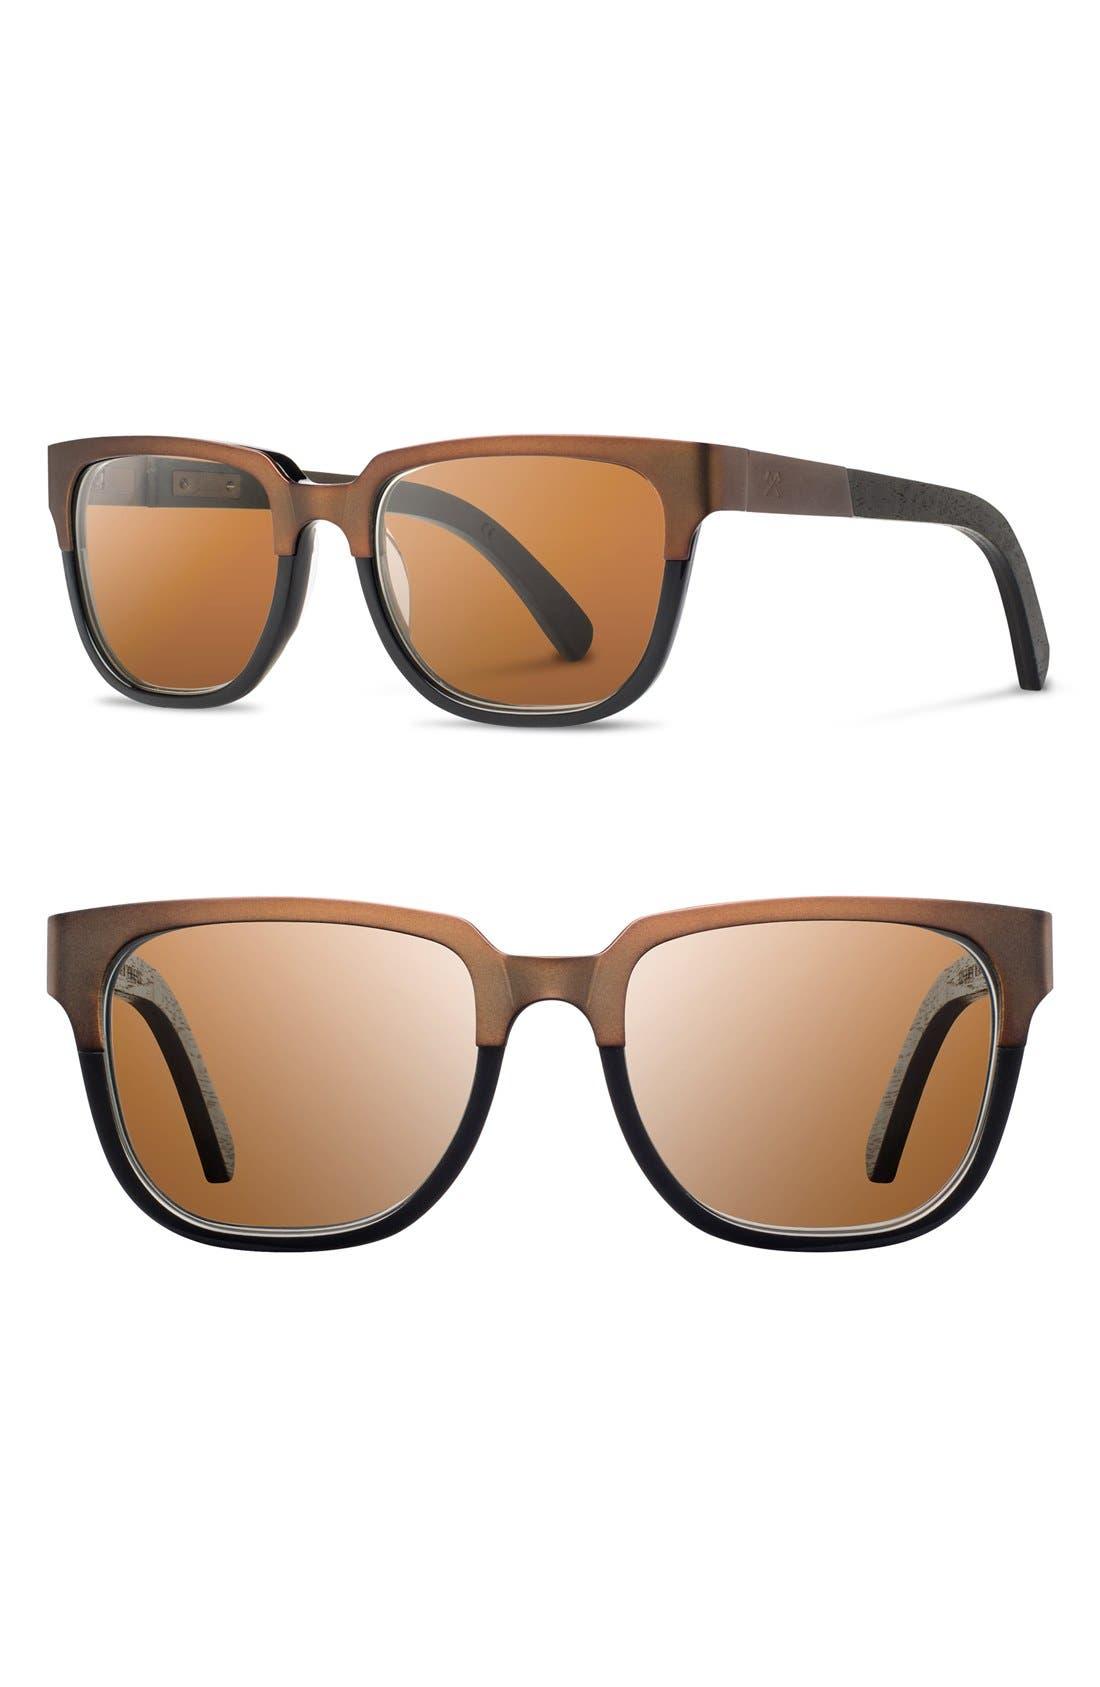 Shwood 'Prescott' 52mm Polarized Titanium & Wood Sunglasses